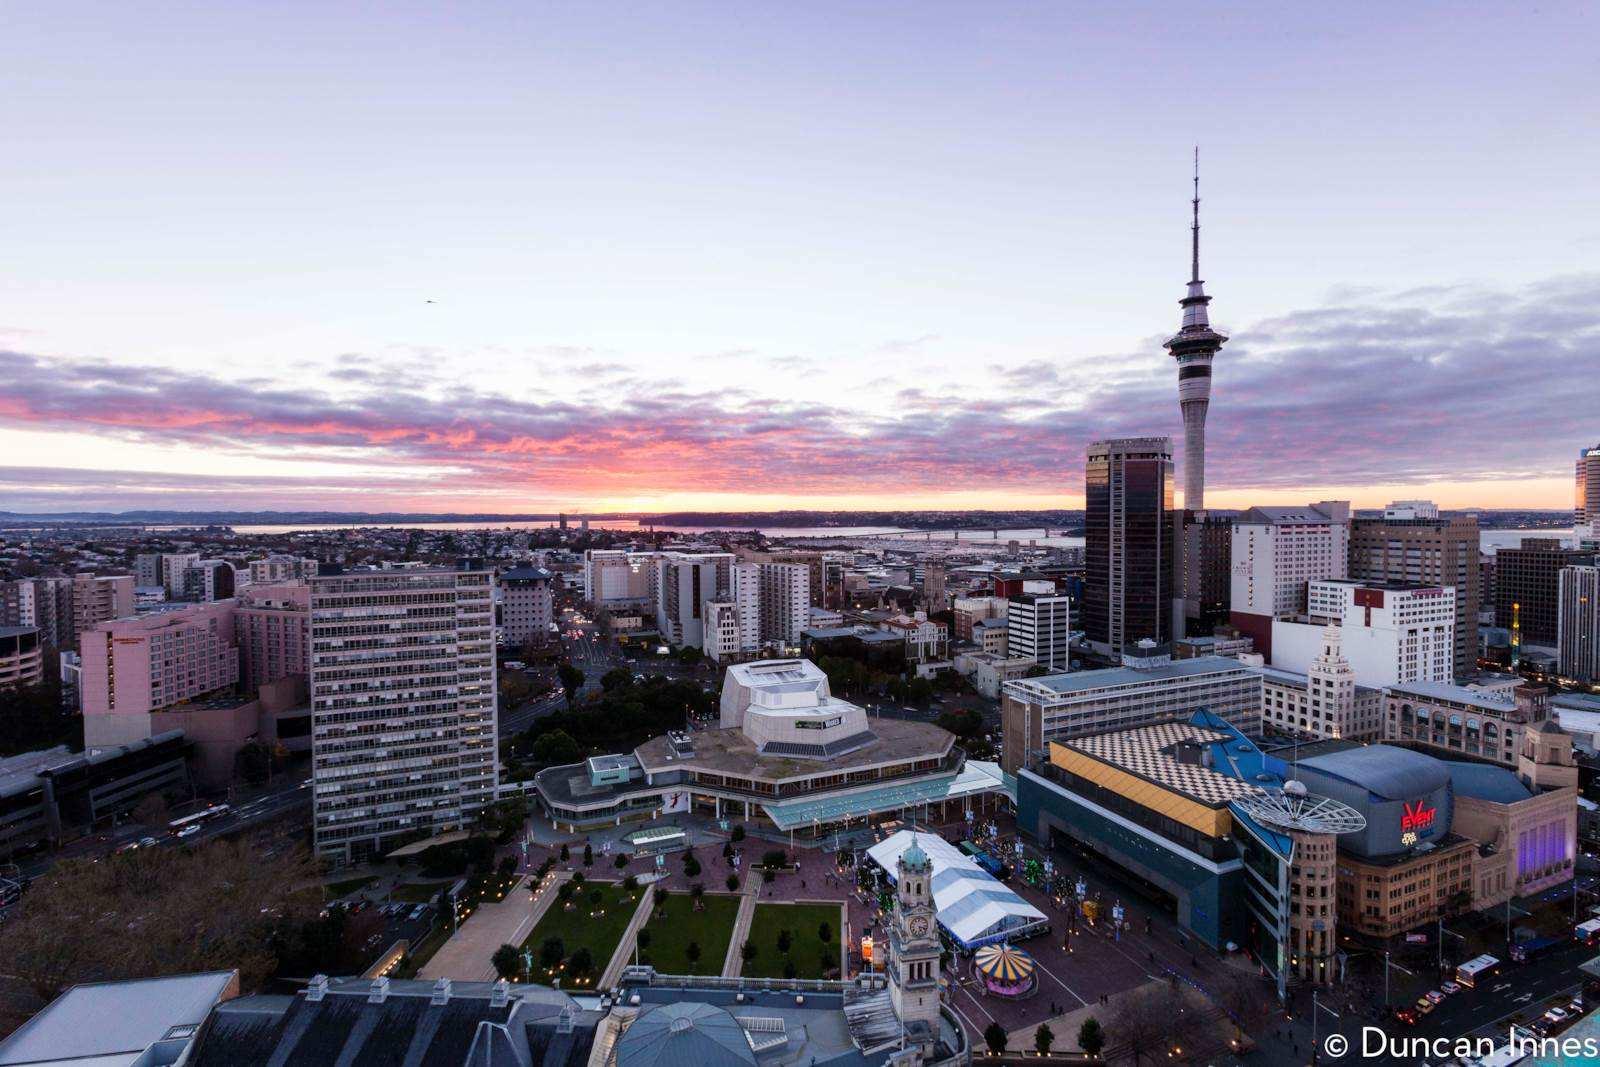 Auckland Central 2房 海外买家可购!全新至臻公寓 CBD顶级地段 知名开发商 自住/投资莫错过 Overseas Buyer Qualified - 2 Bed + Car Park